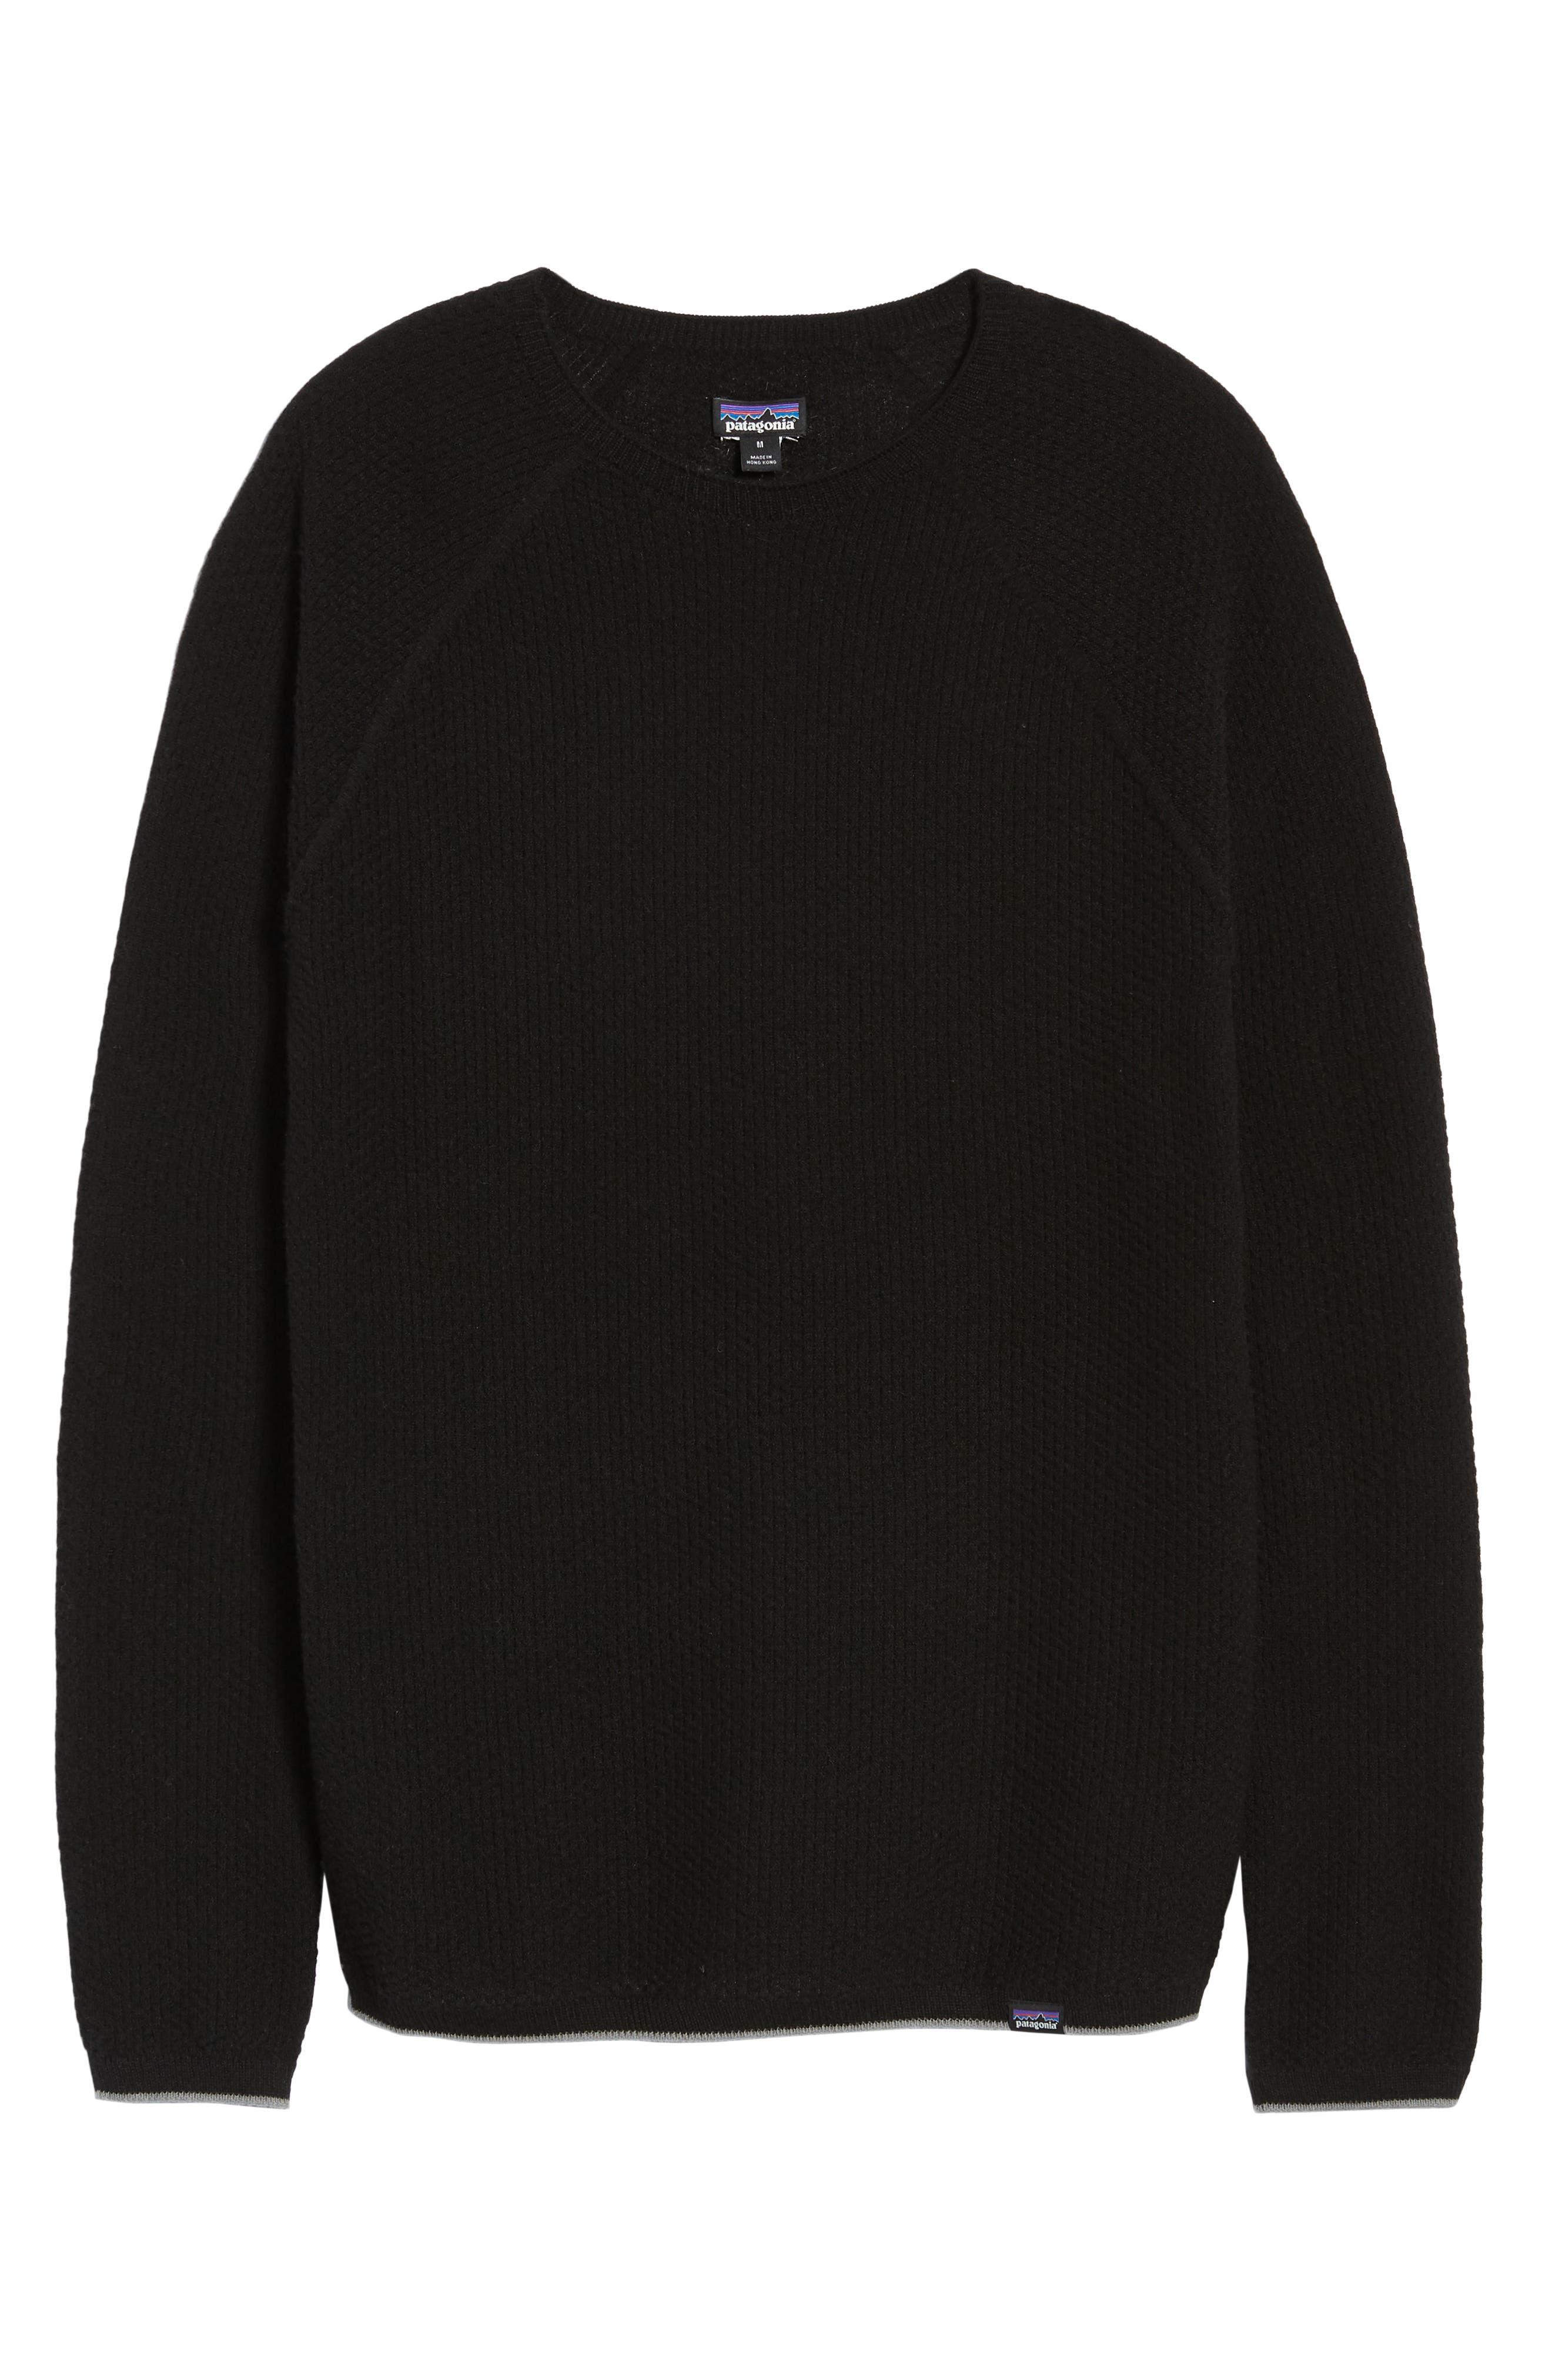 Capilene<sup>®</sup> Lightweight Air Crew Sweater,                             Alternate thumbnail 6, color,                             BLACK